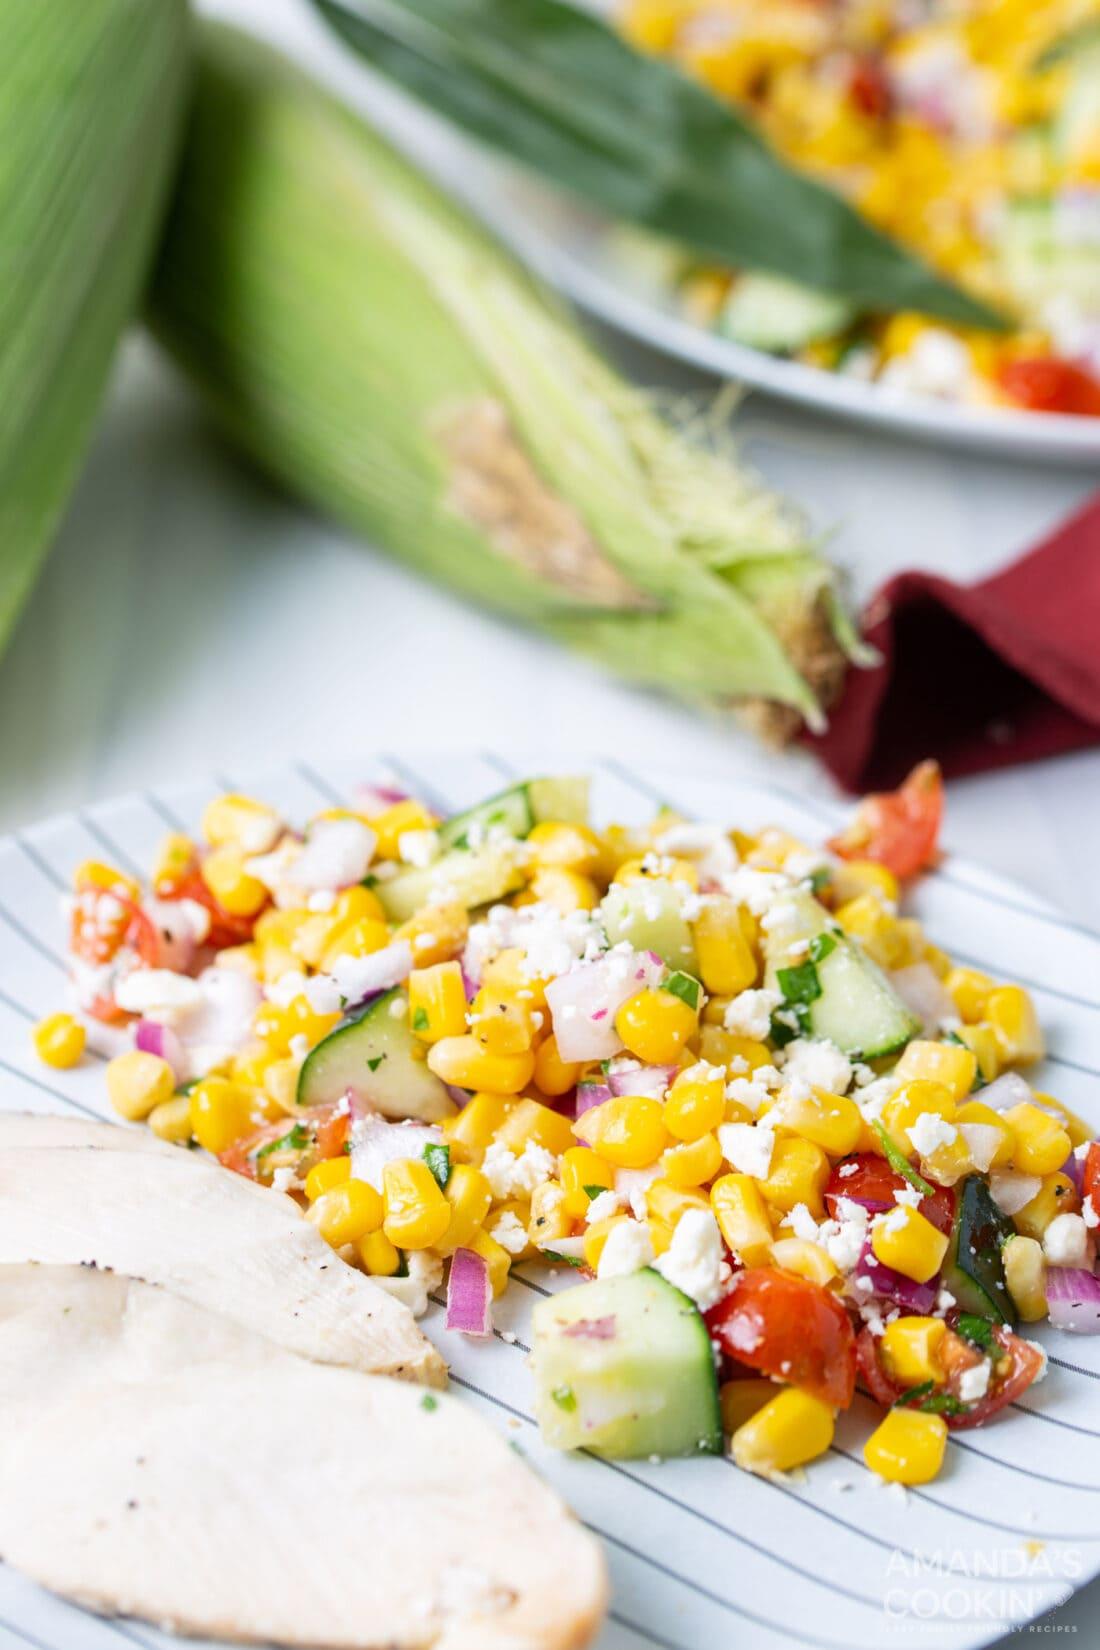 Corn Salad on the side